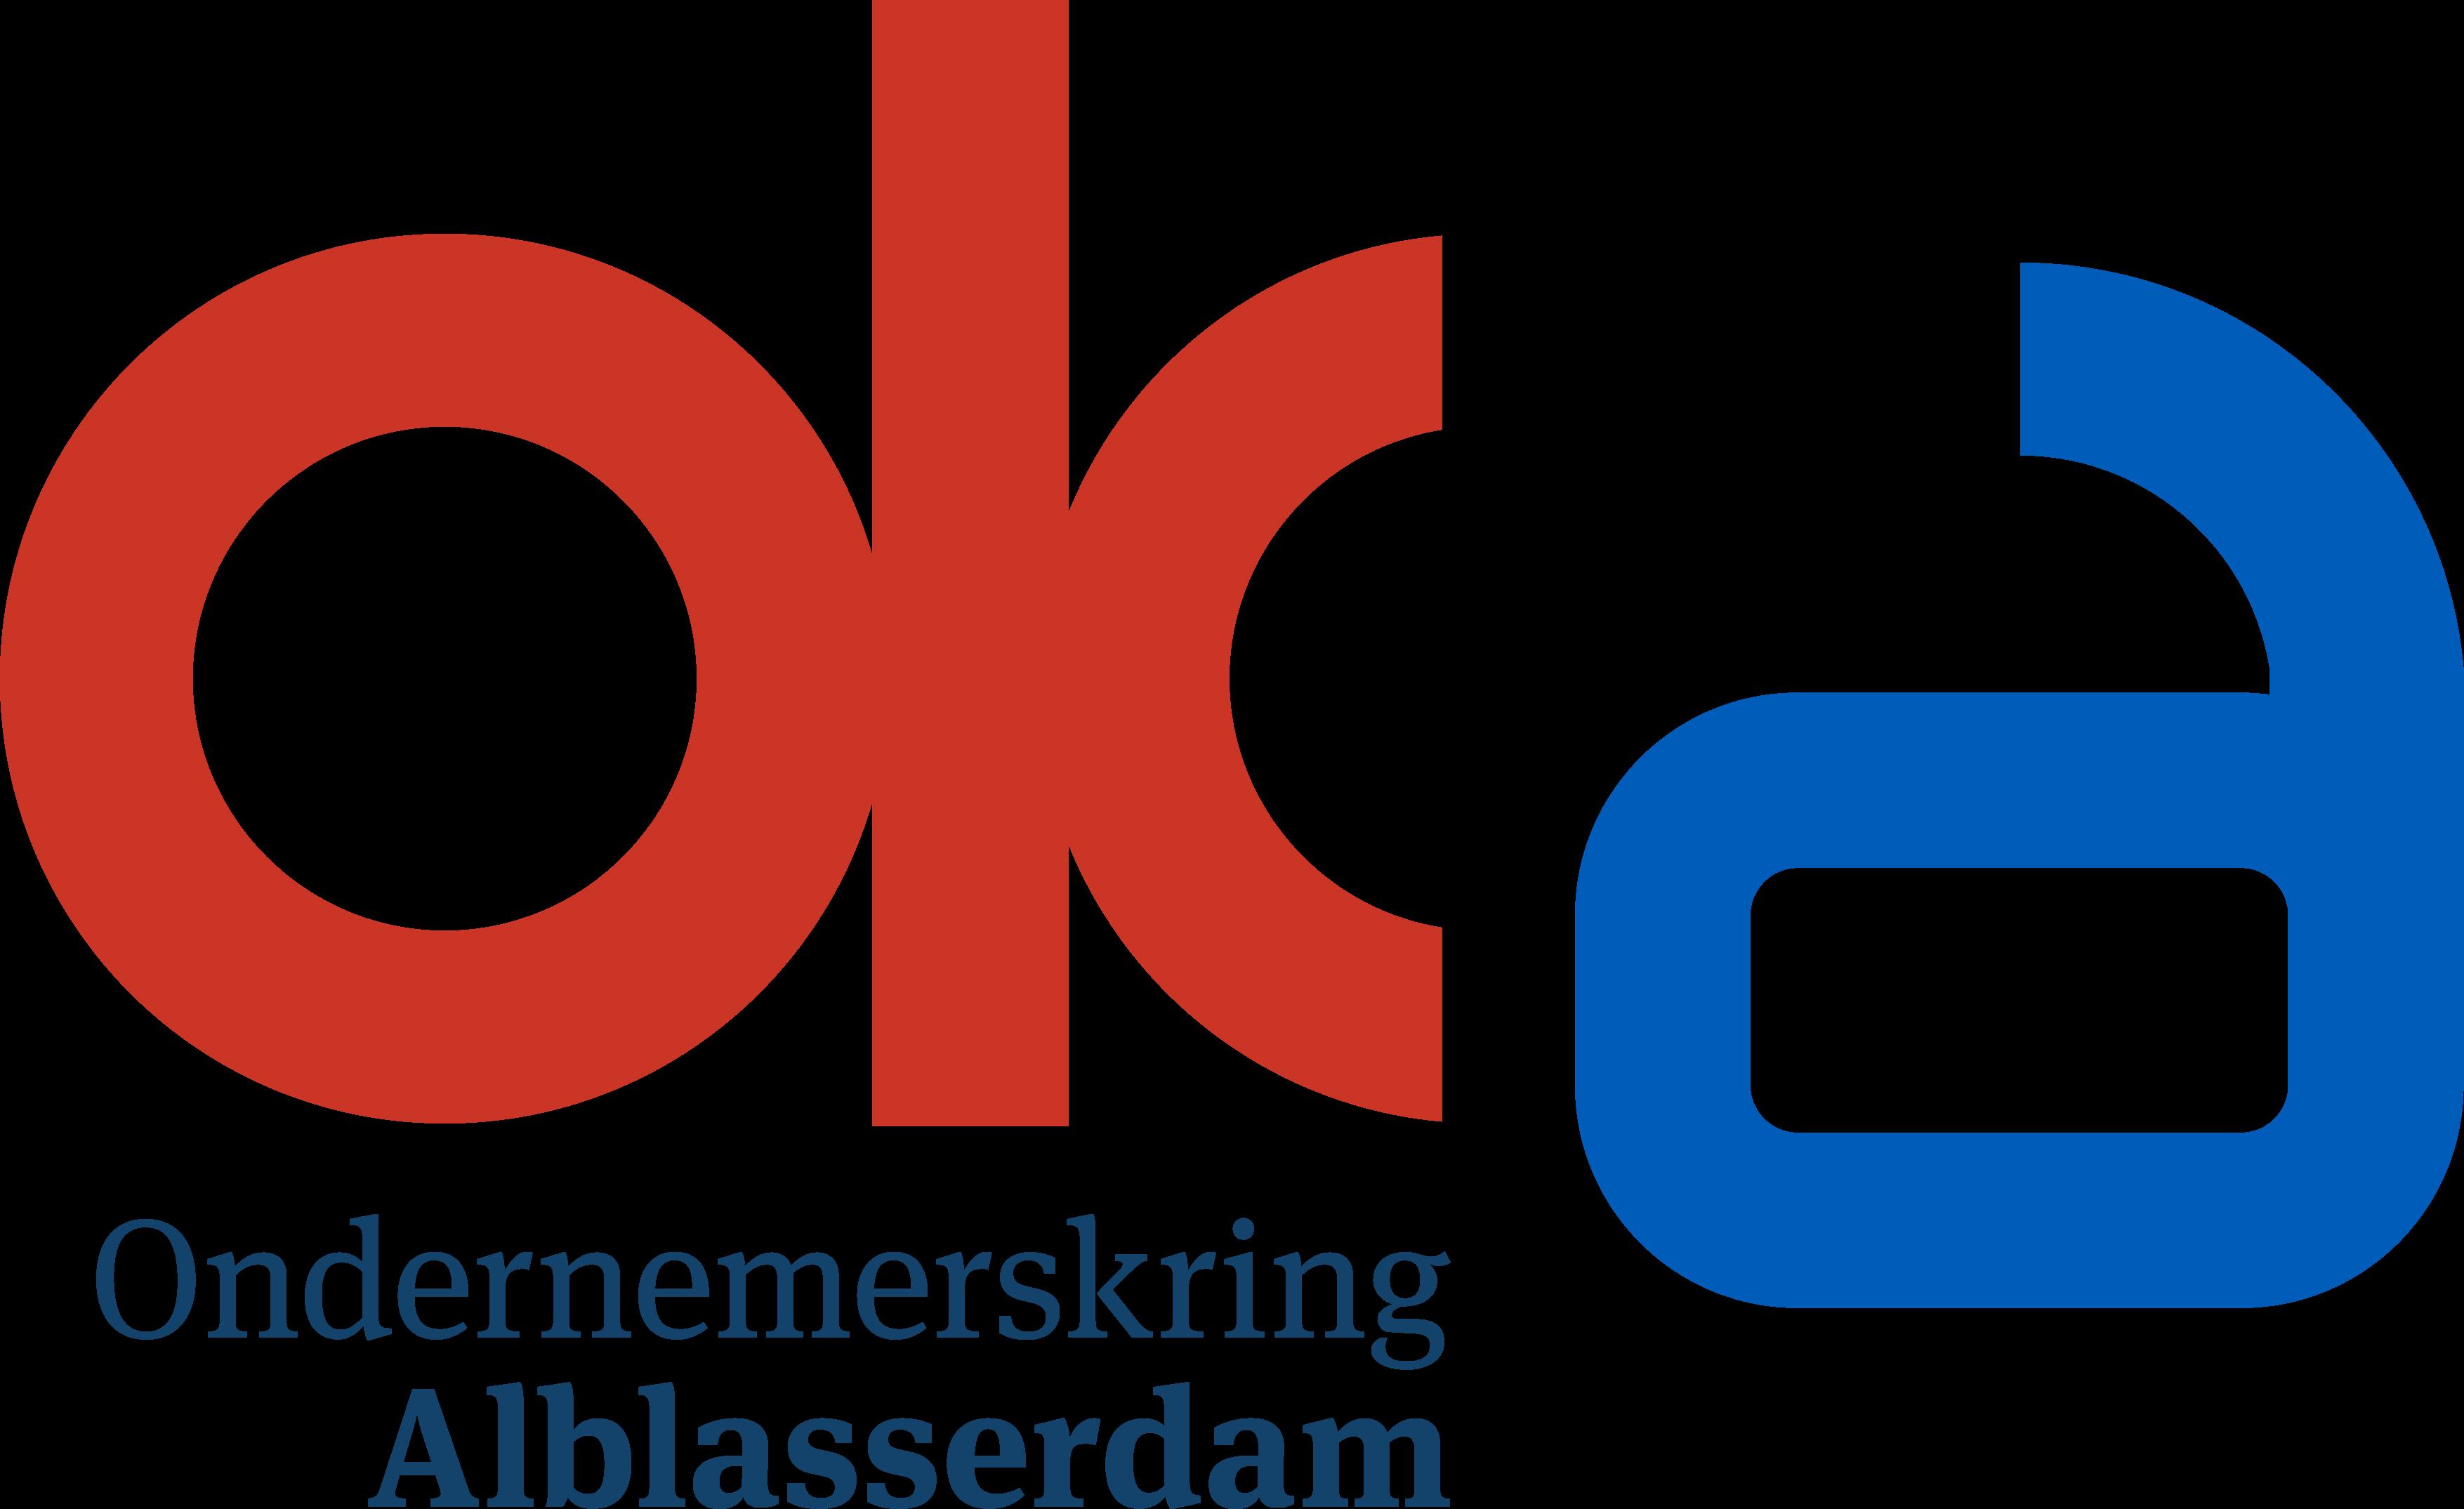 Ondernemerskring Alblasserdam